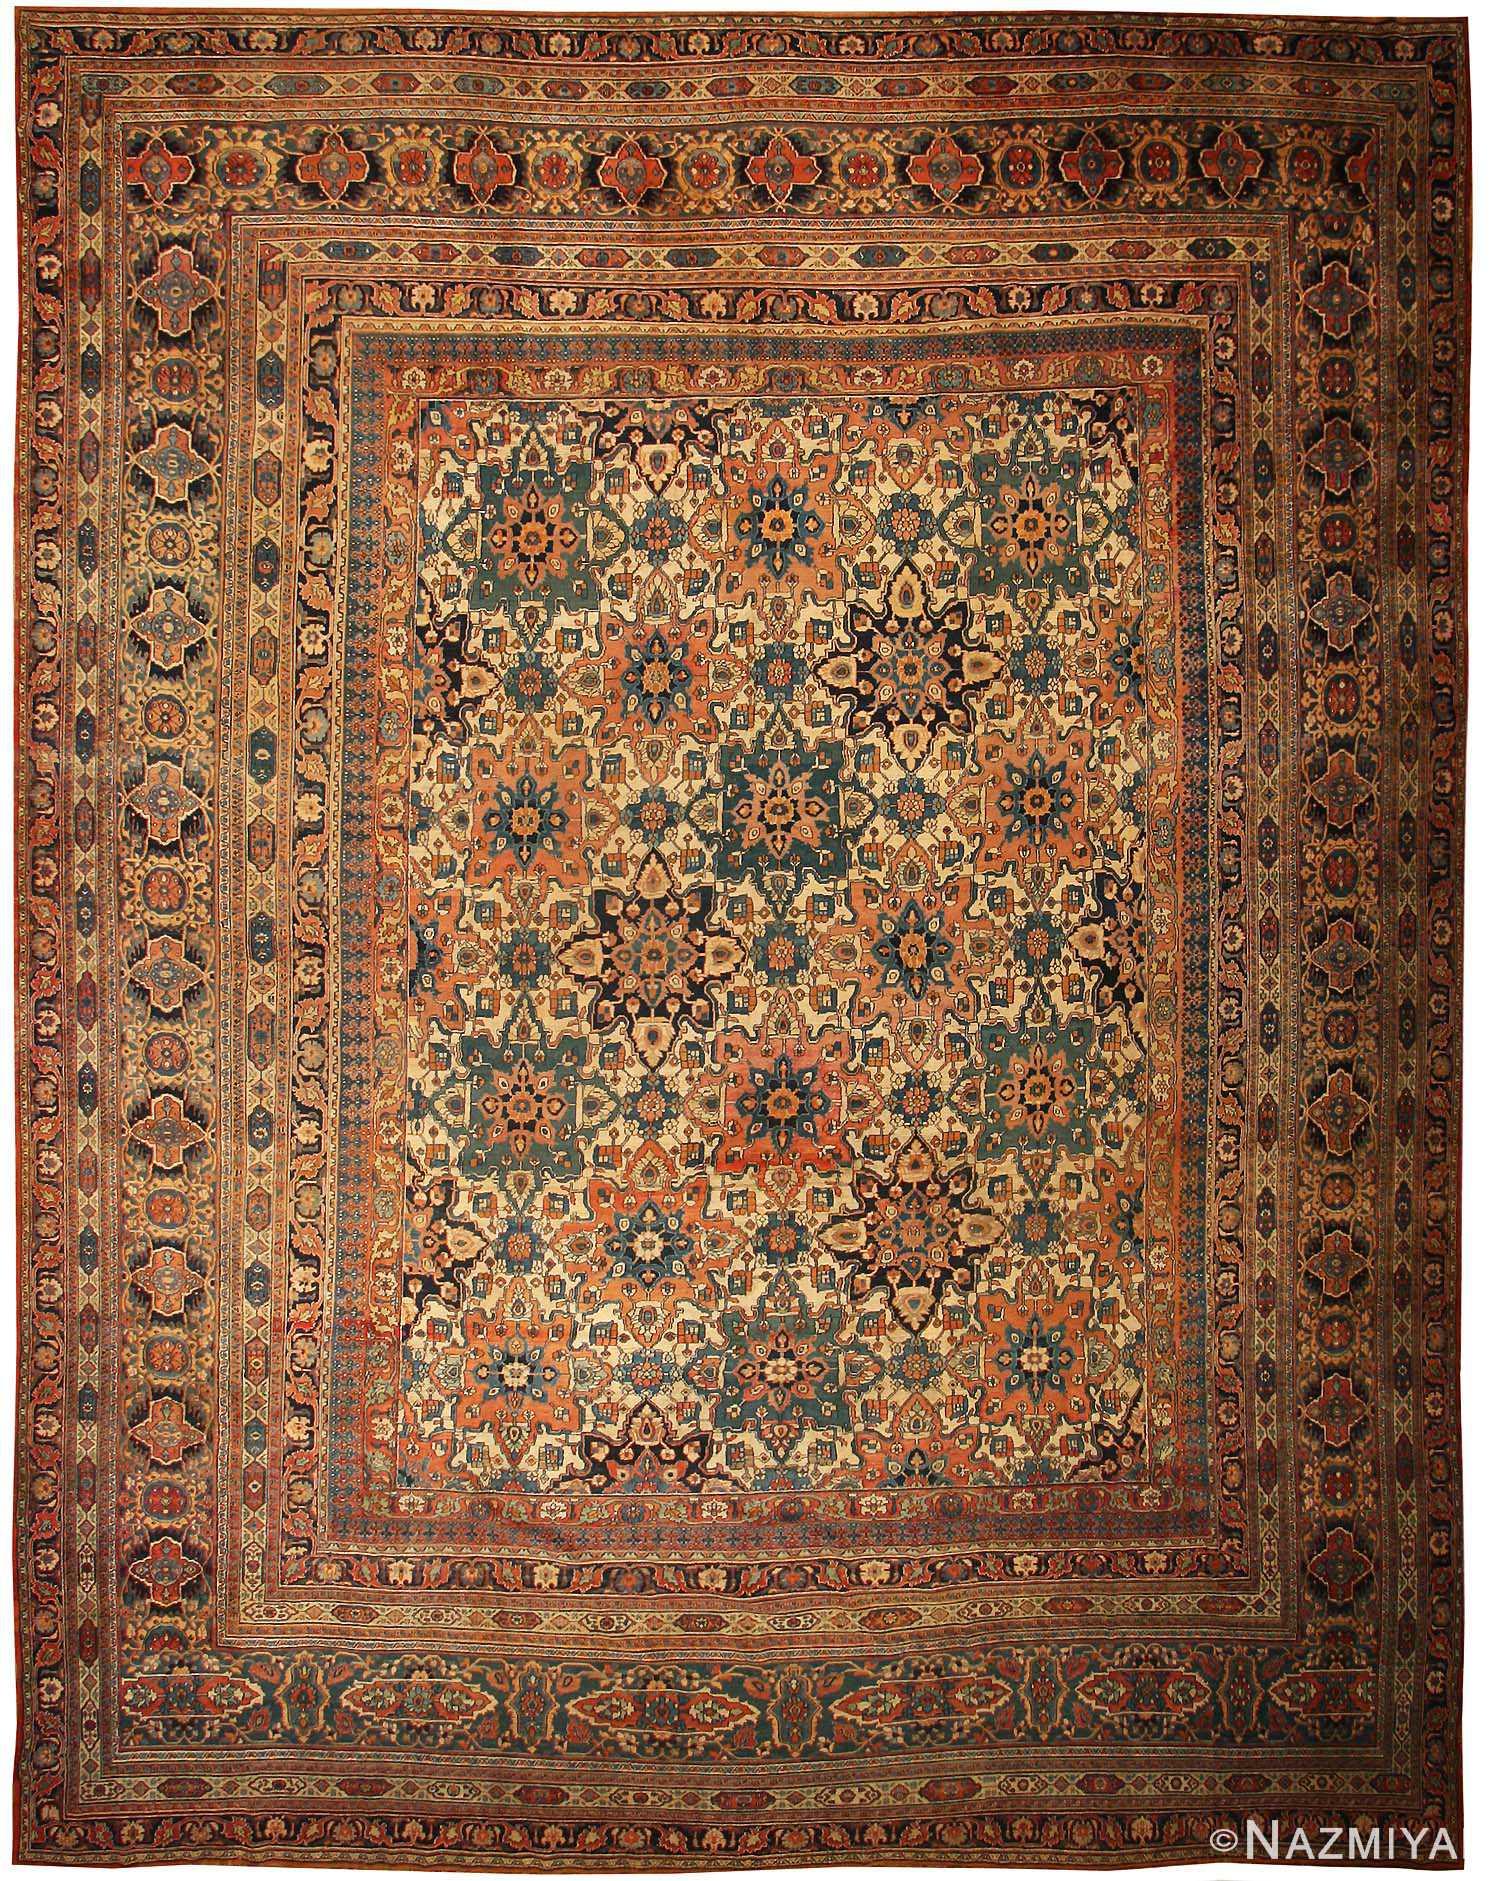 Antique Khorassan Persian Rugs carpet 44046 antique khorassan persian